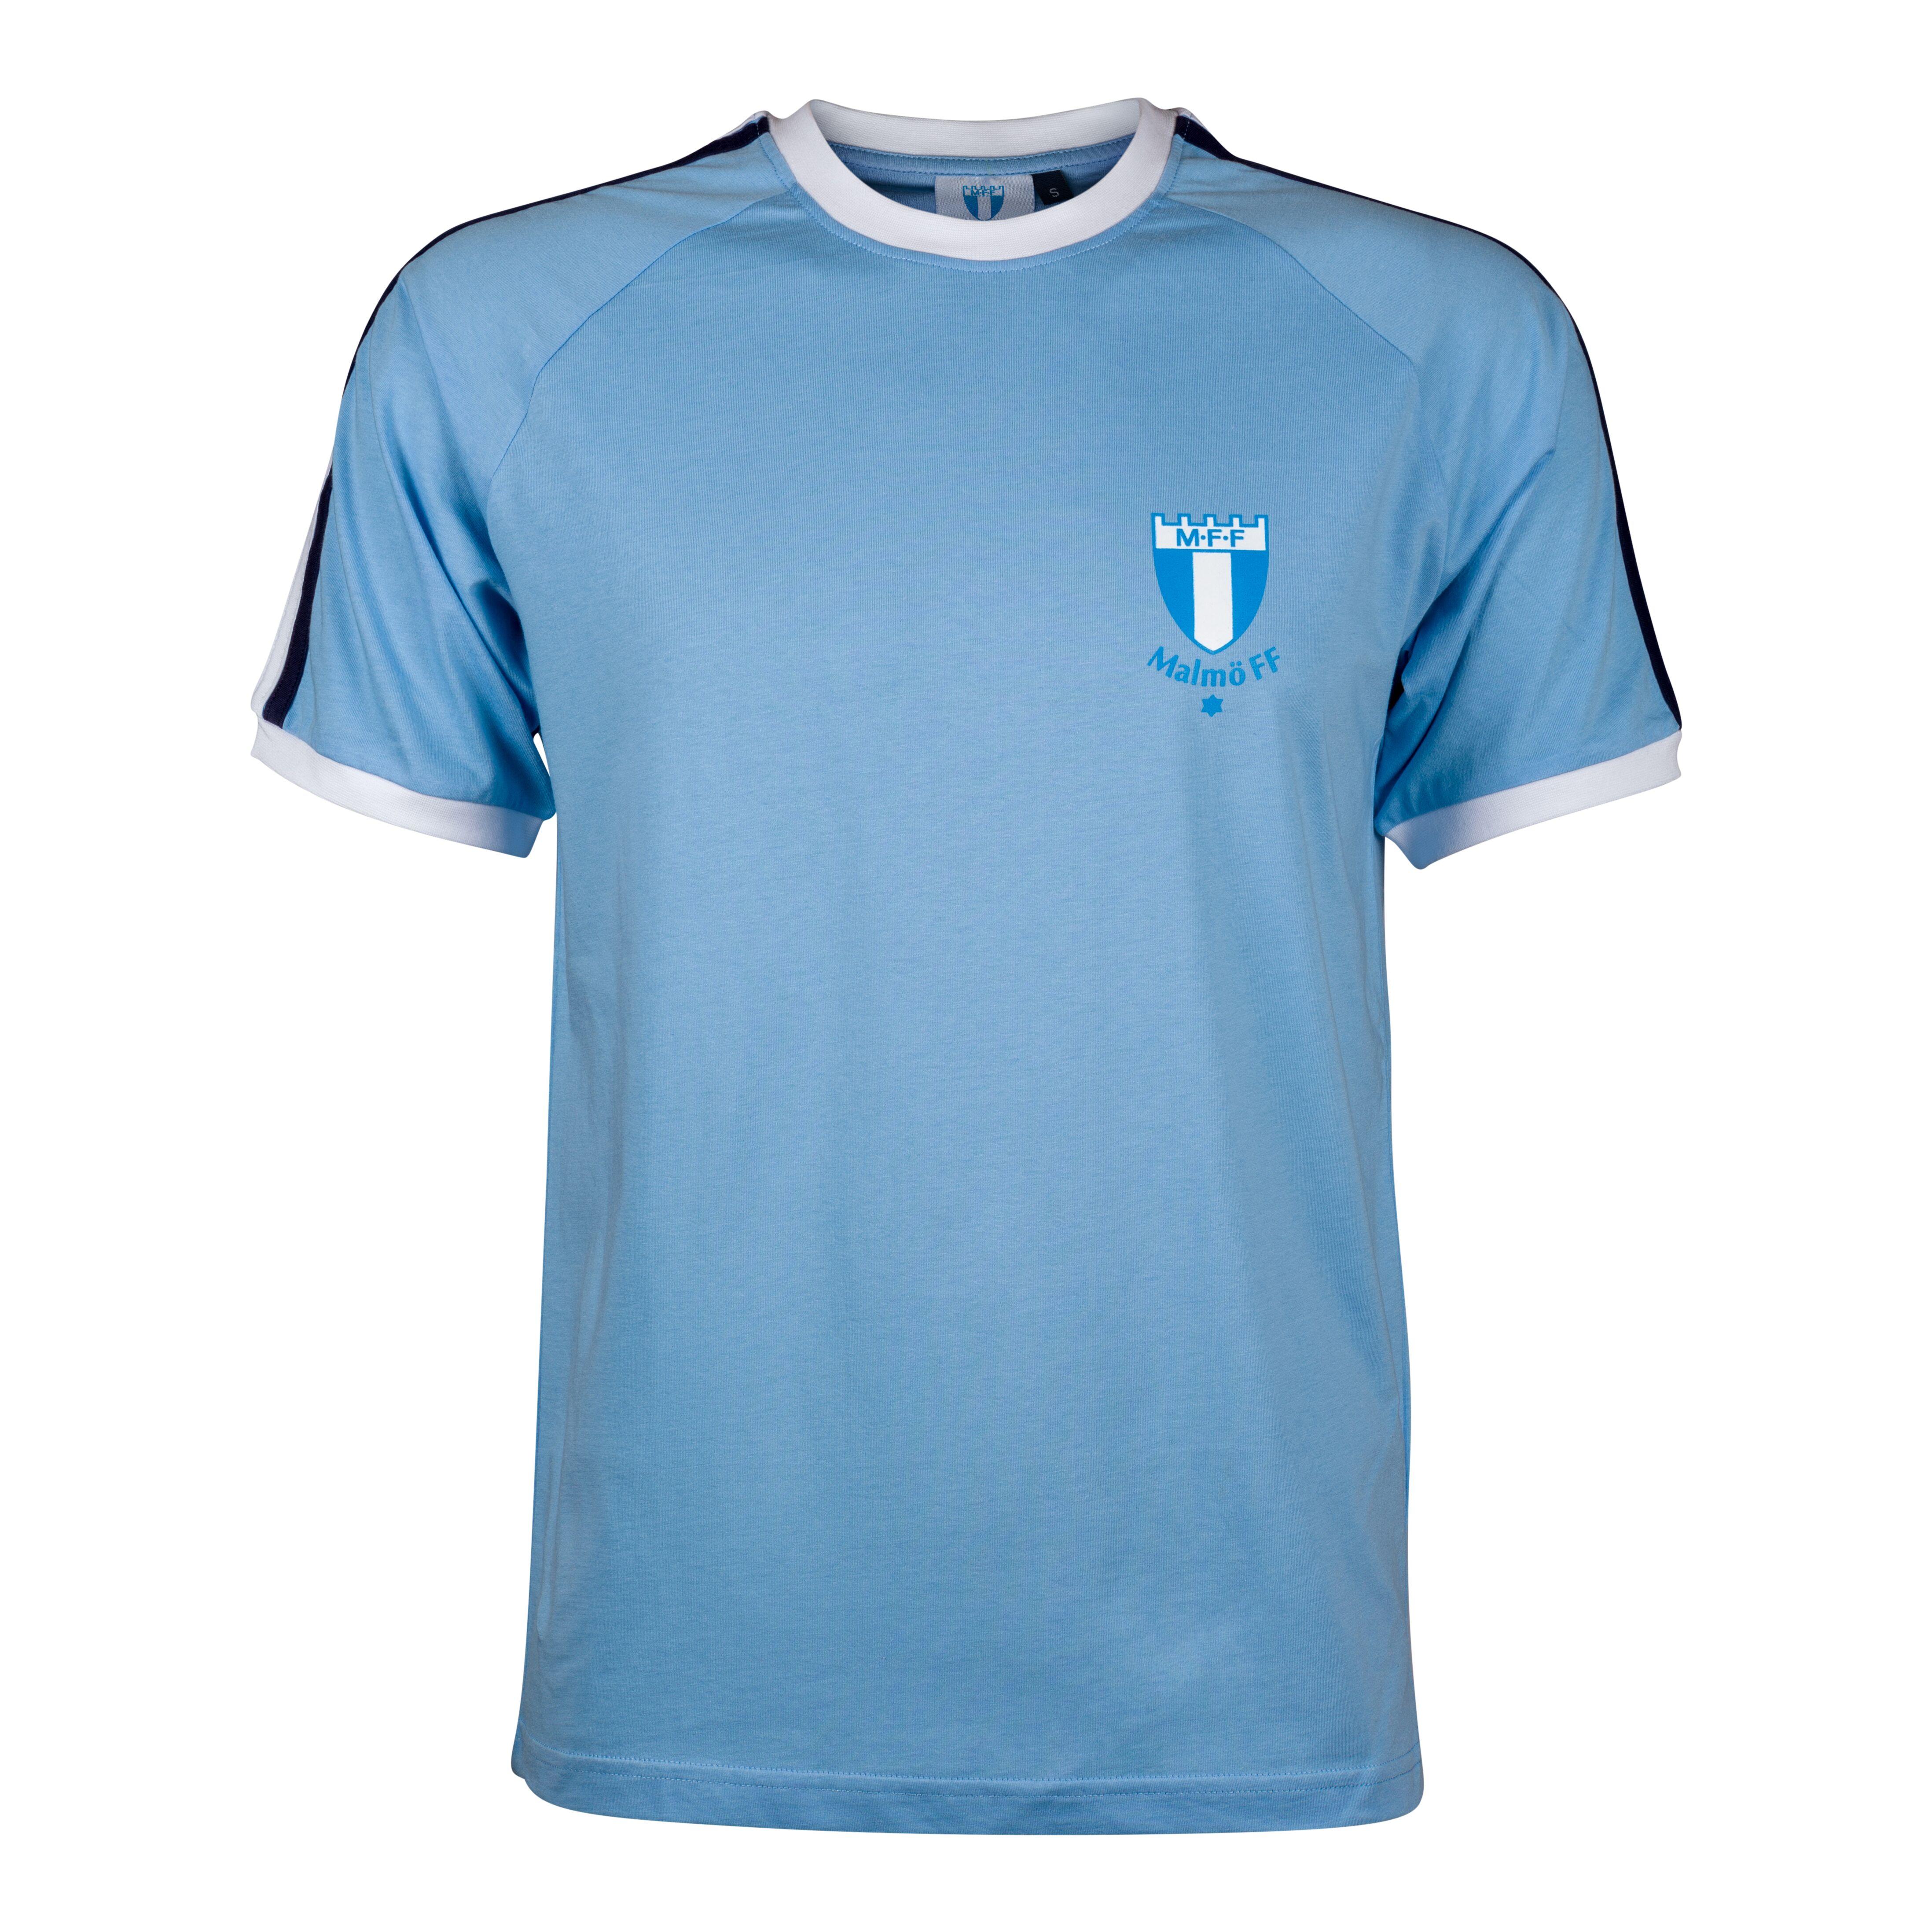 T-shirt ljusblå retro